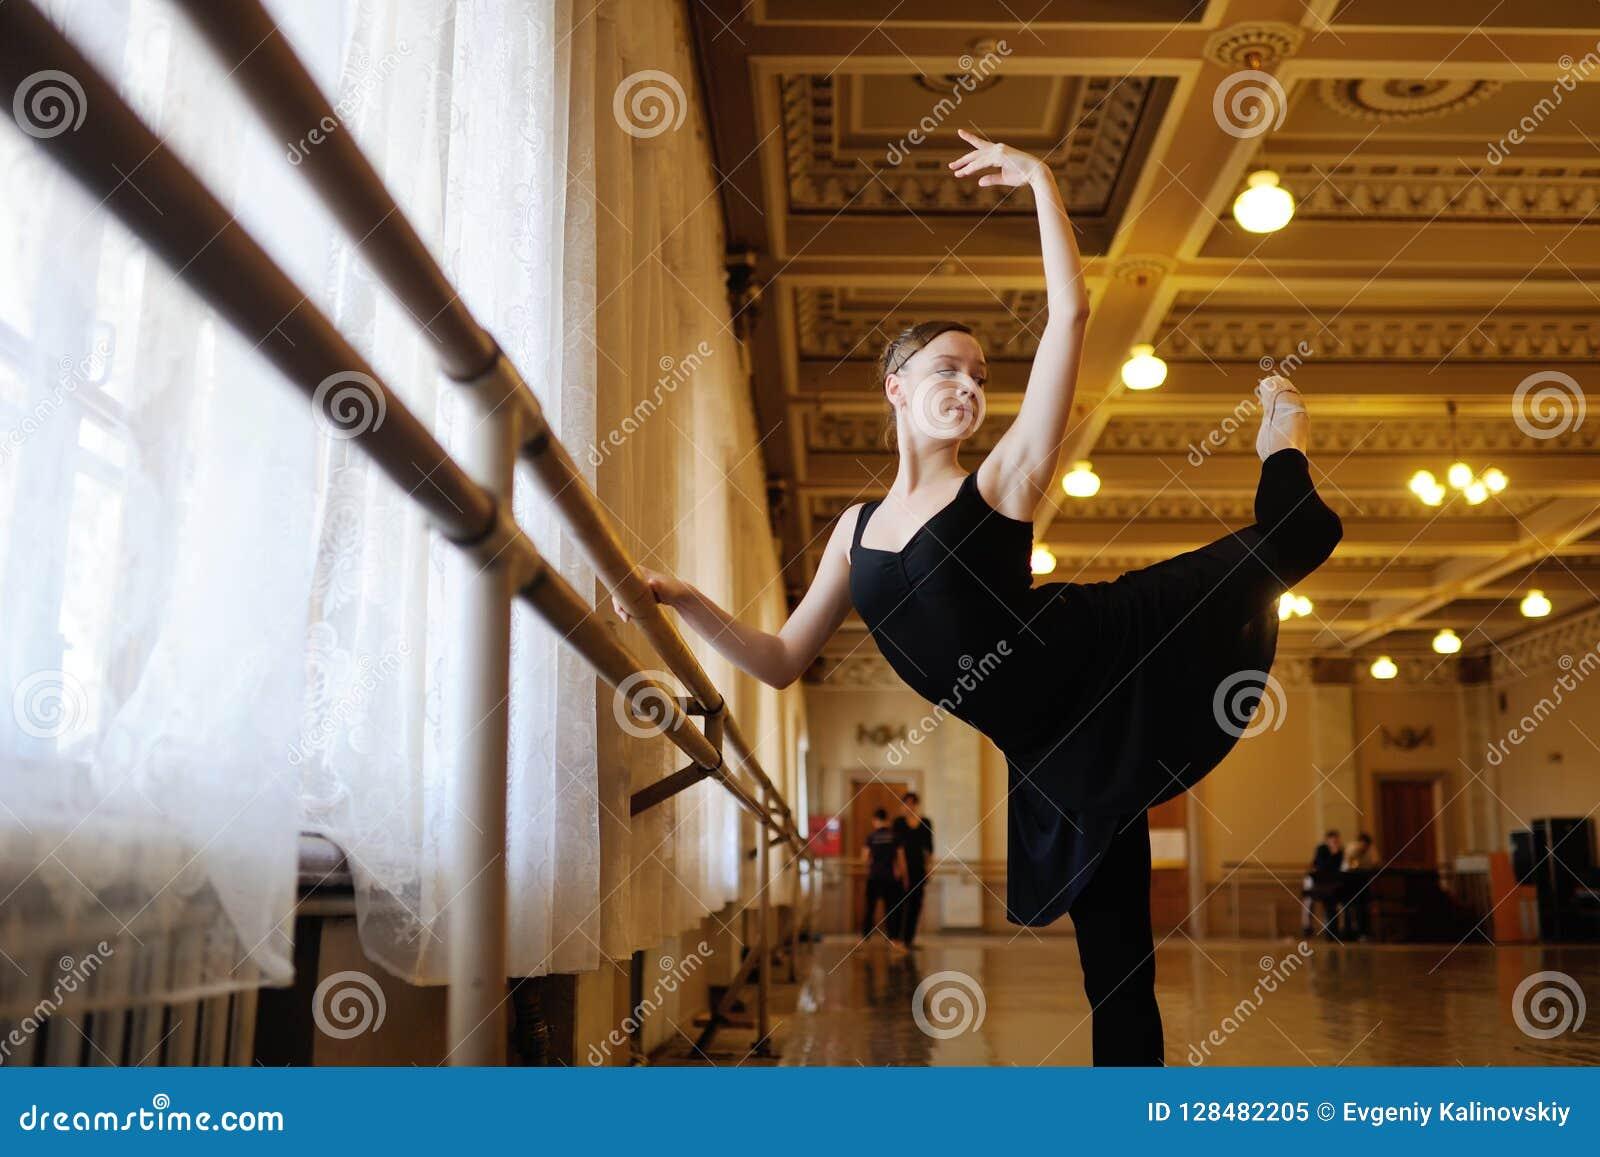 Ballerina in rehearsal or training in ballet class